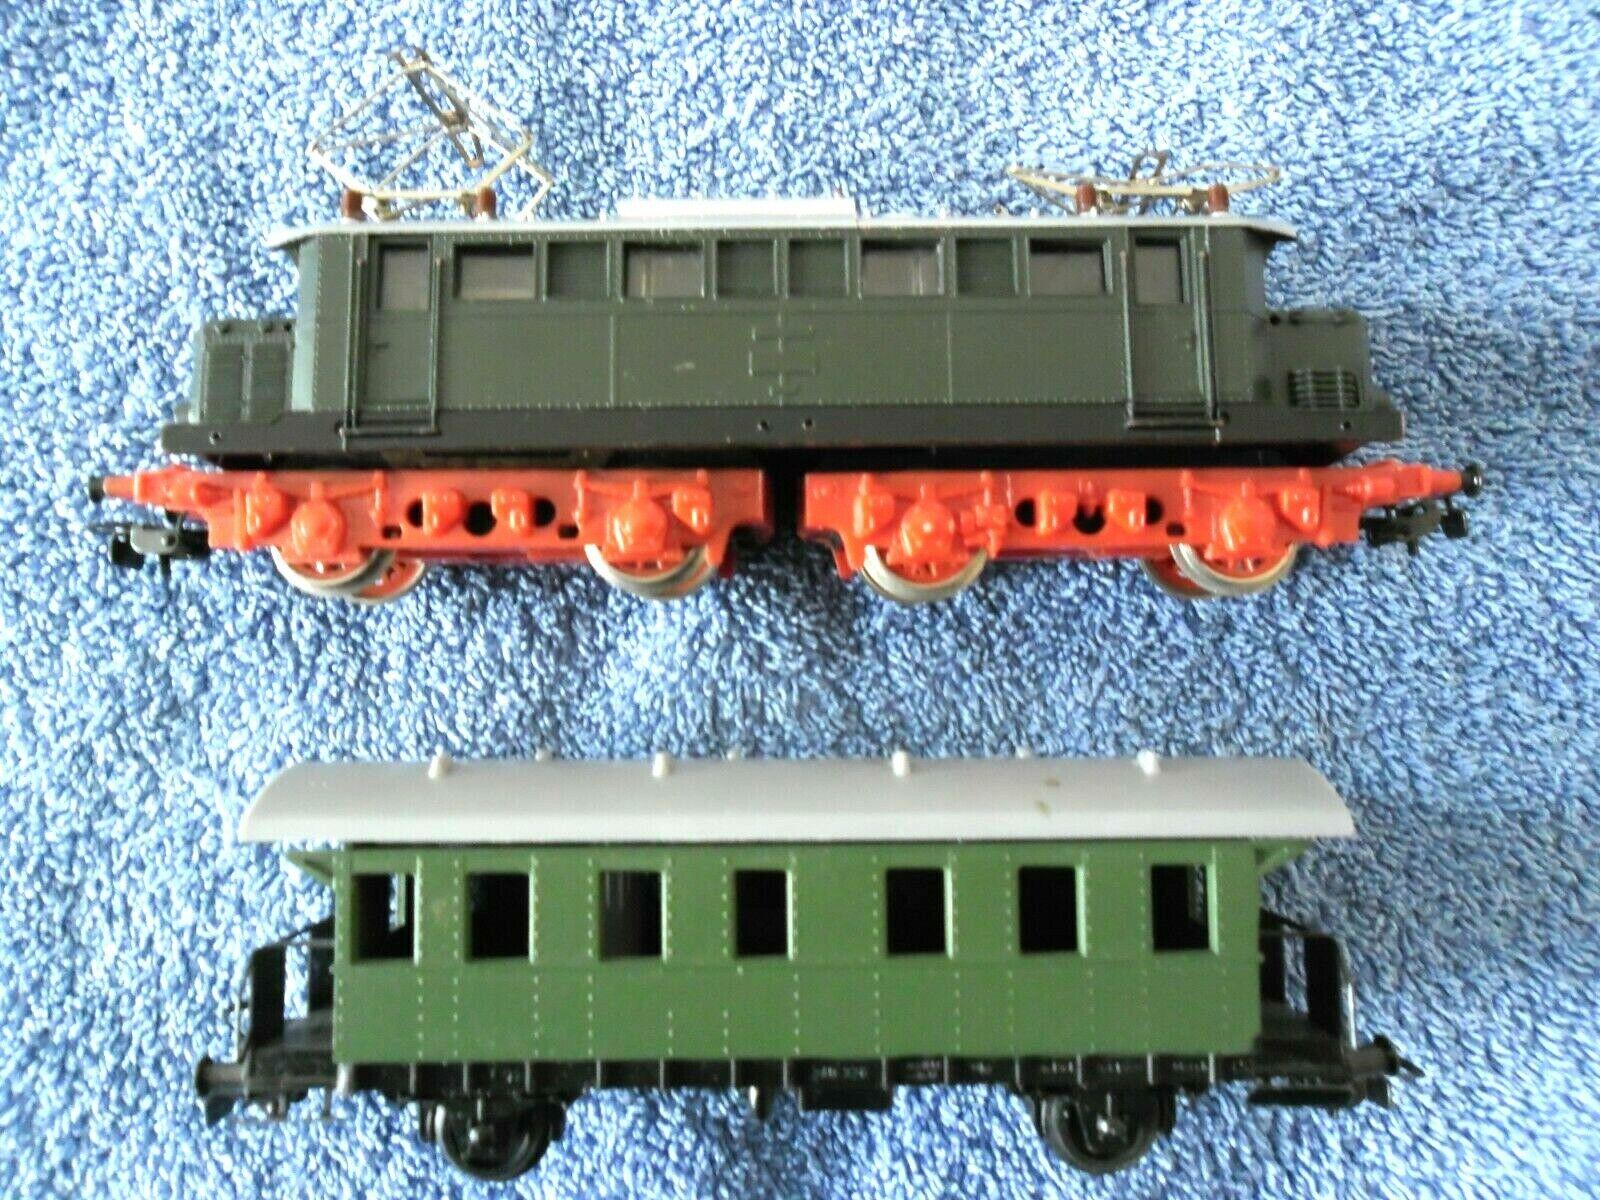 Electric locomotive wagon piko sonneberg 340-328 heimatbhf saalfield oh whz